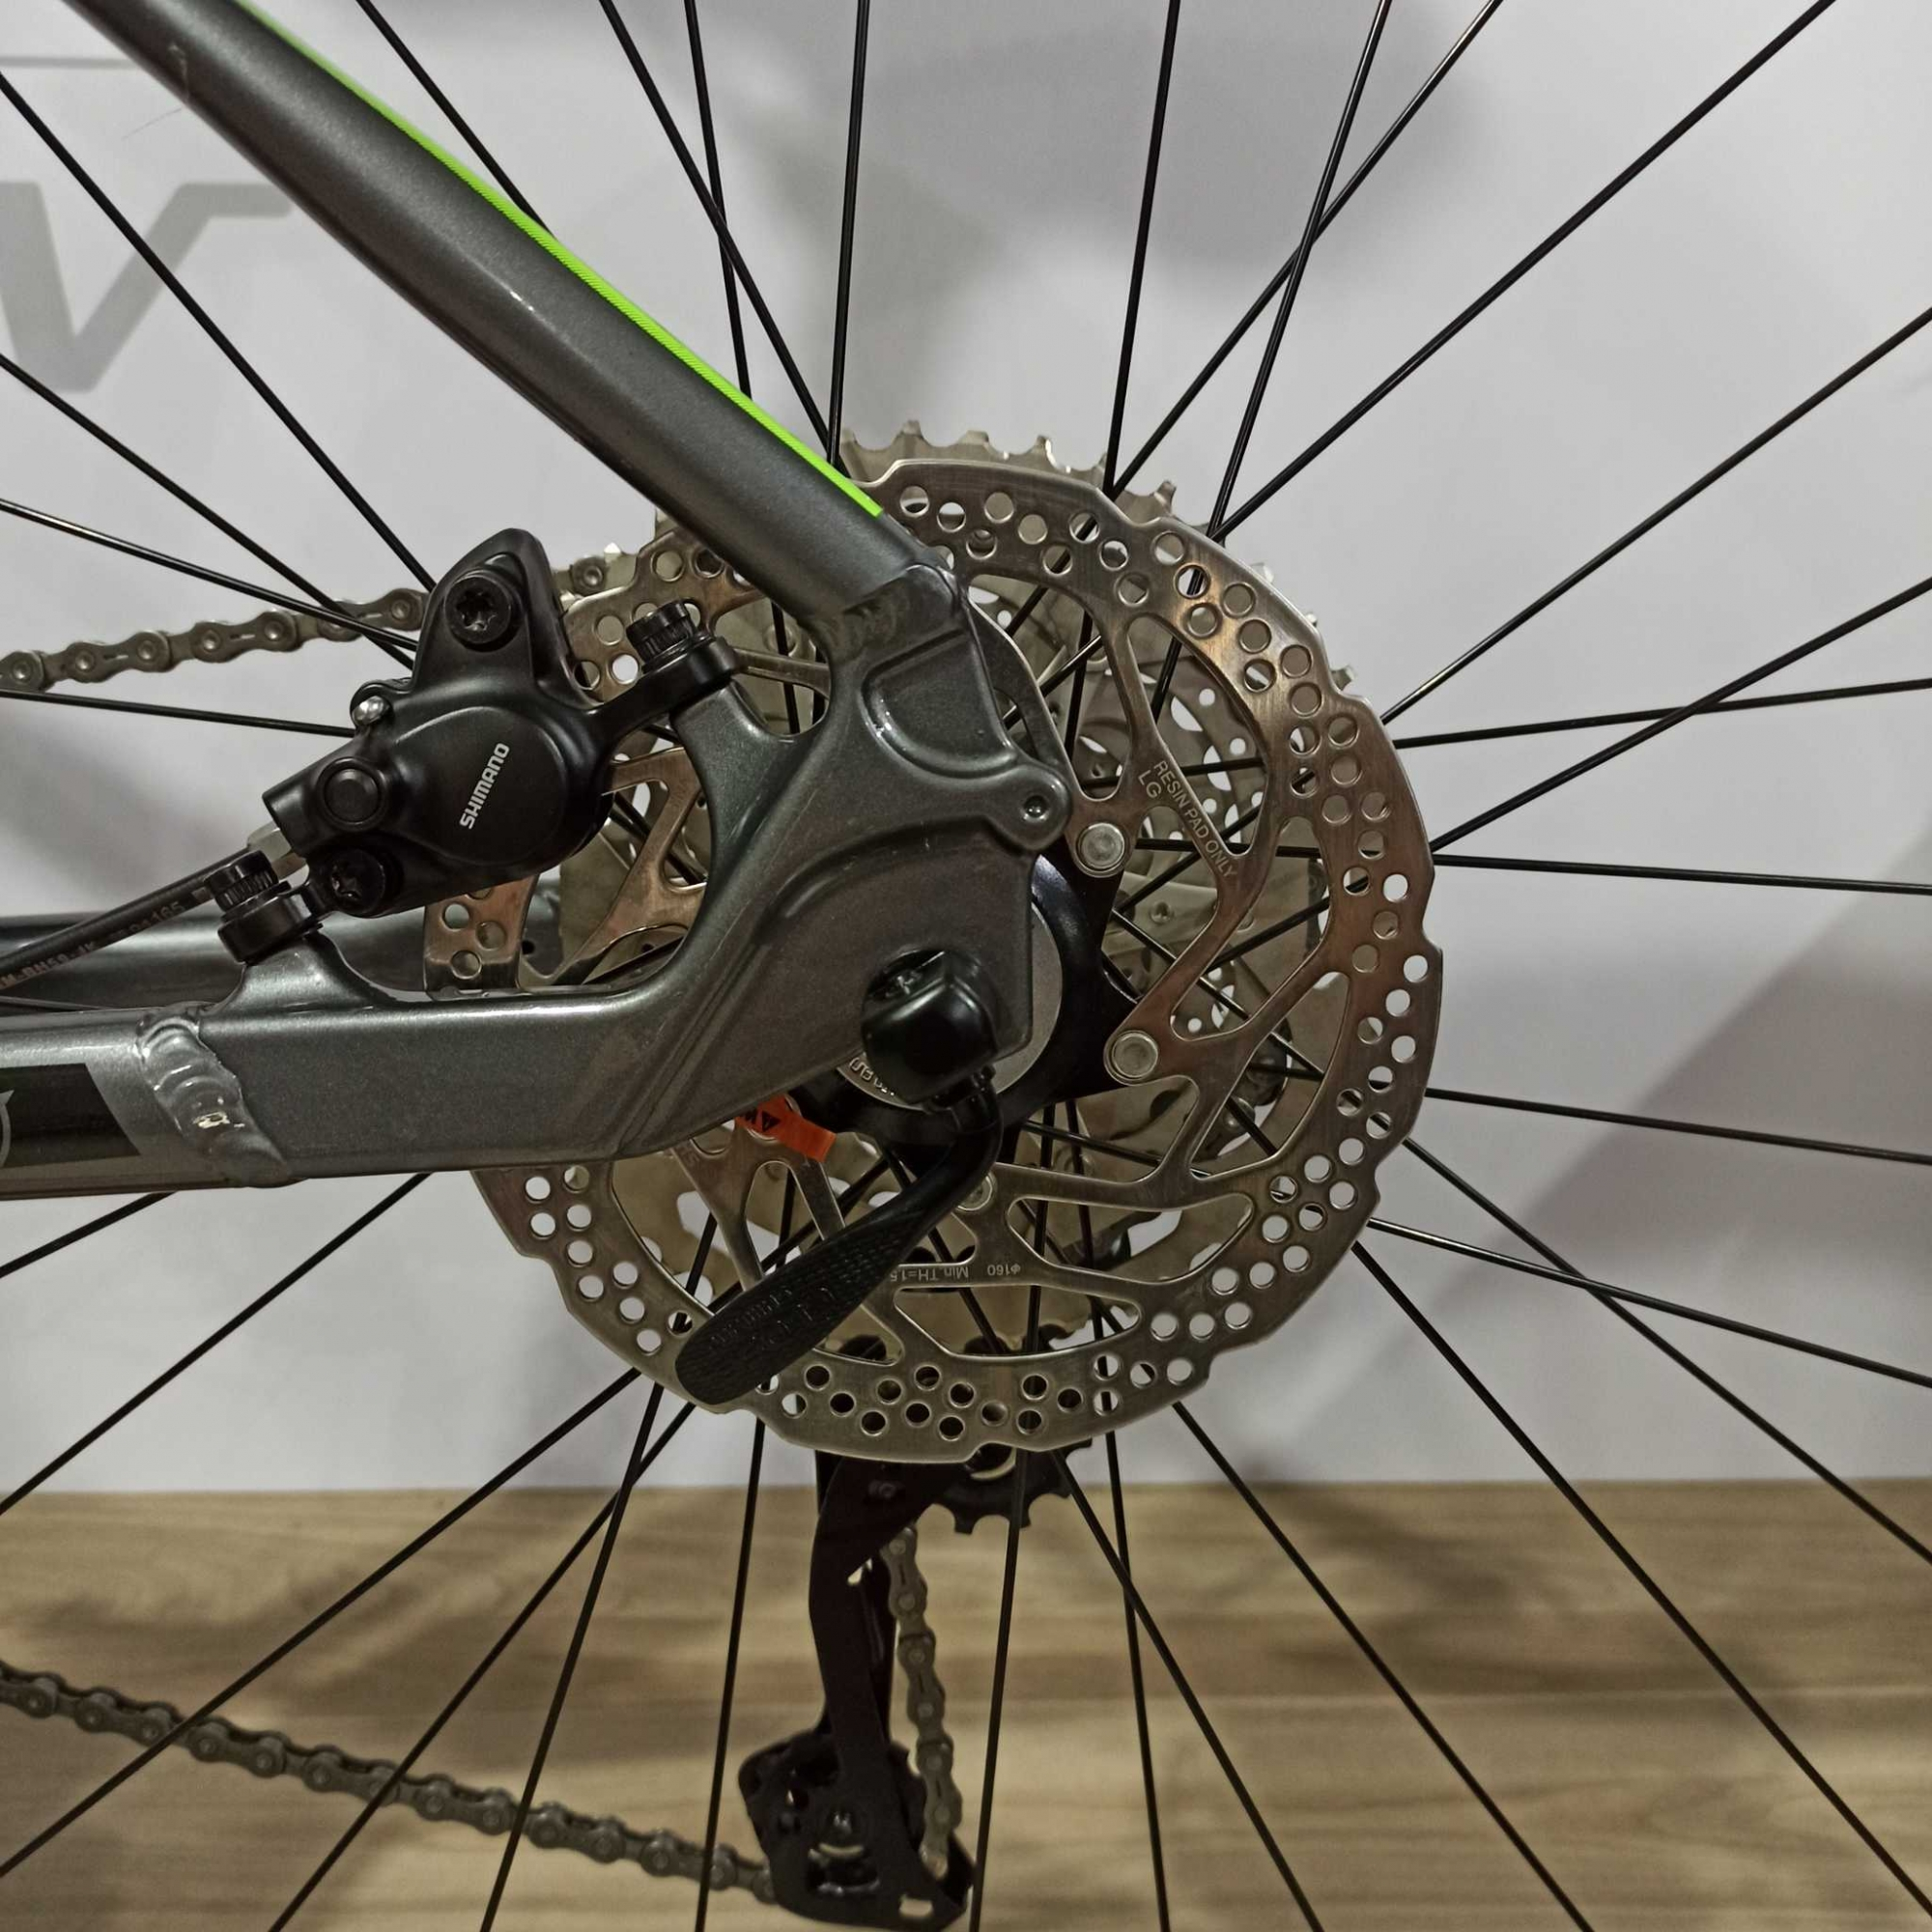 Bicicleta TSW Stamina aro 29 - 20v Shimano Deore UPGRADE - Preto/Cinza/Verde